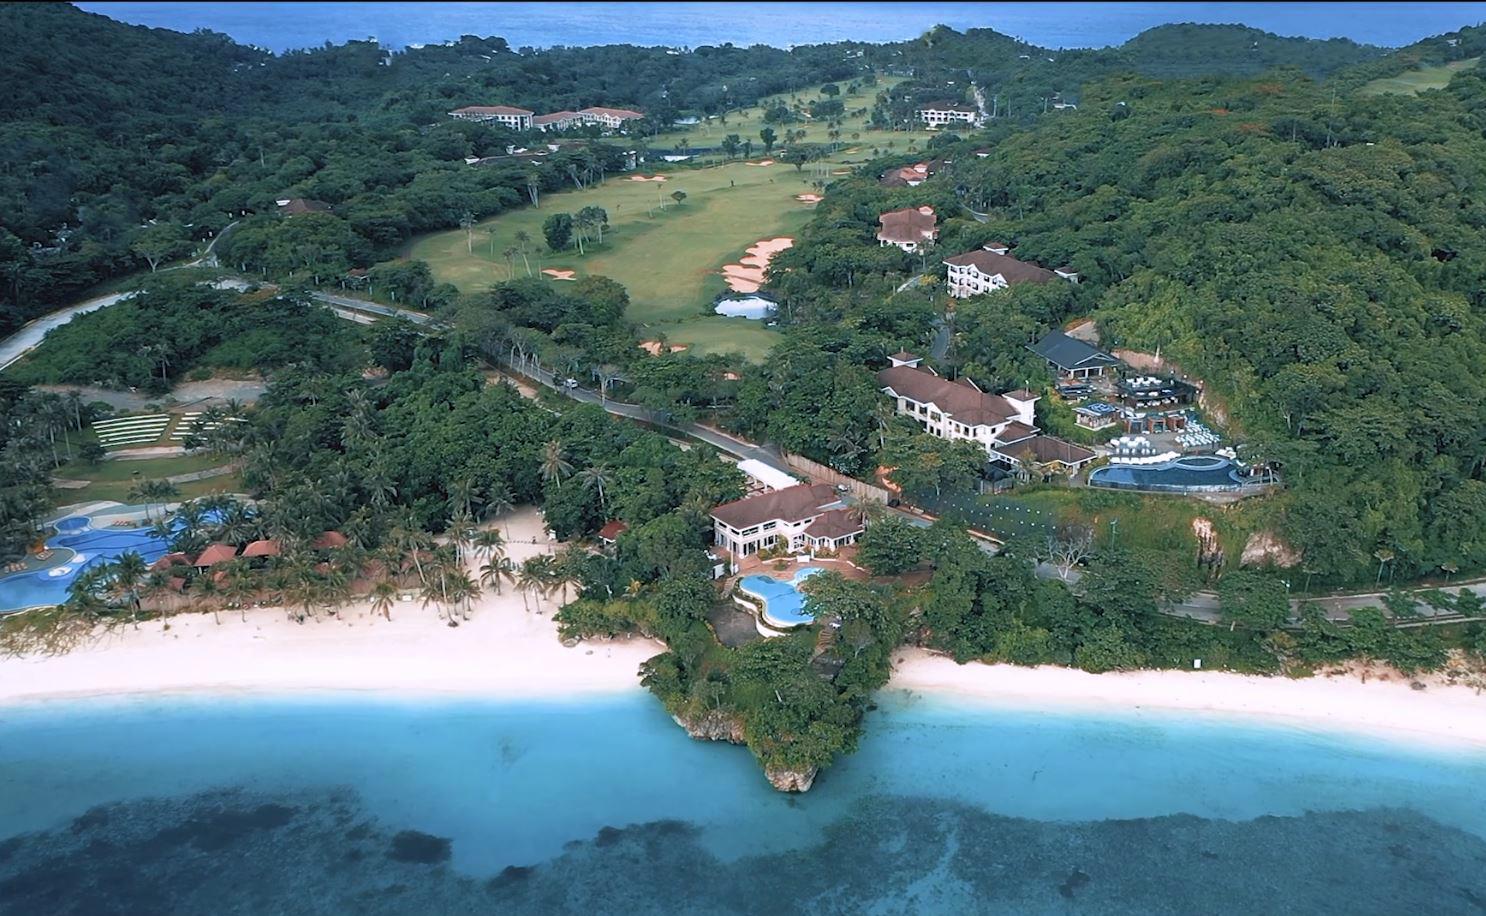 Aerial view of Fairways & Bluewater Resort's wide beach area